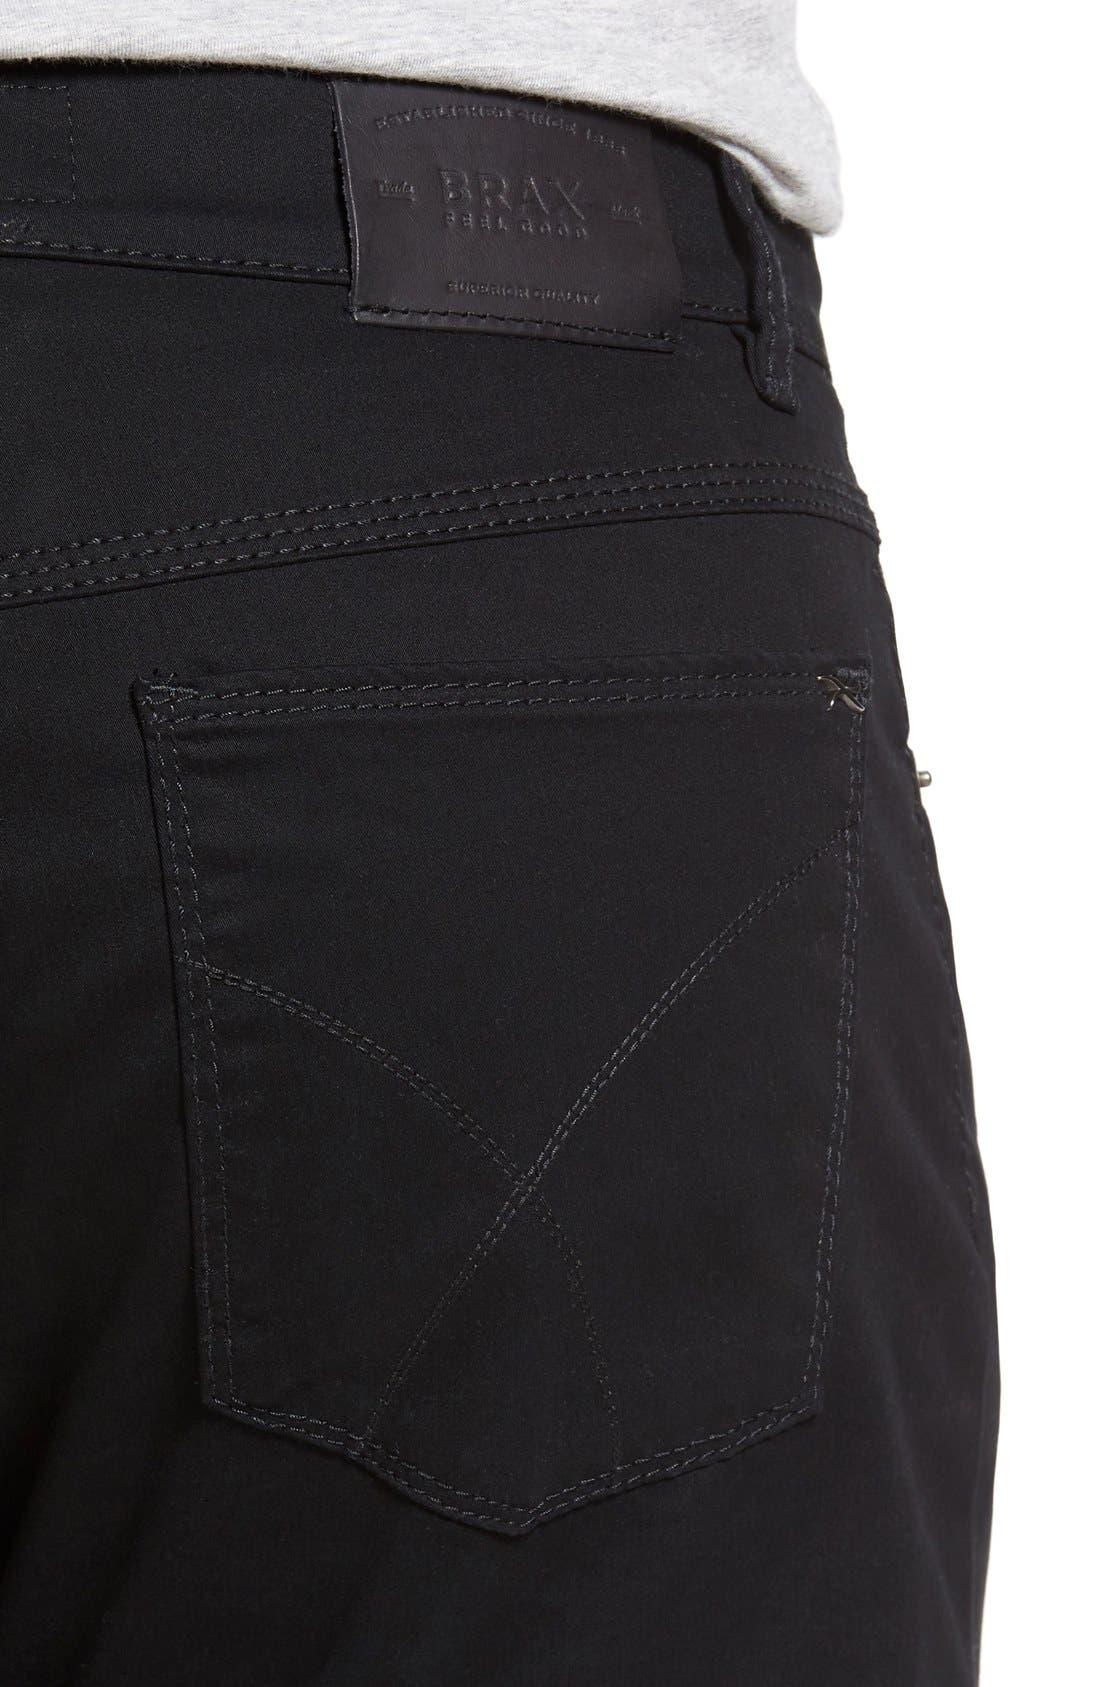 Cooper Prestige Stretch Cotton Pants,                             Alternate thumbnail 10, color,                             PERMA BLACK